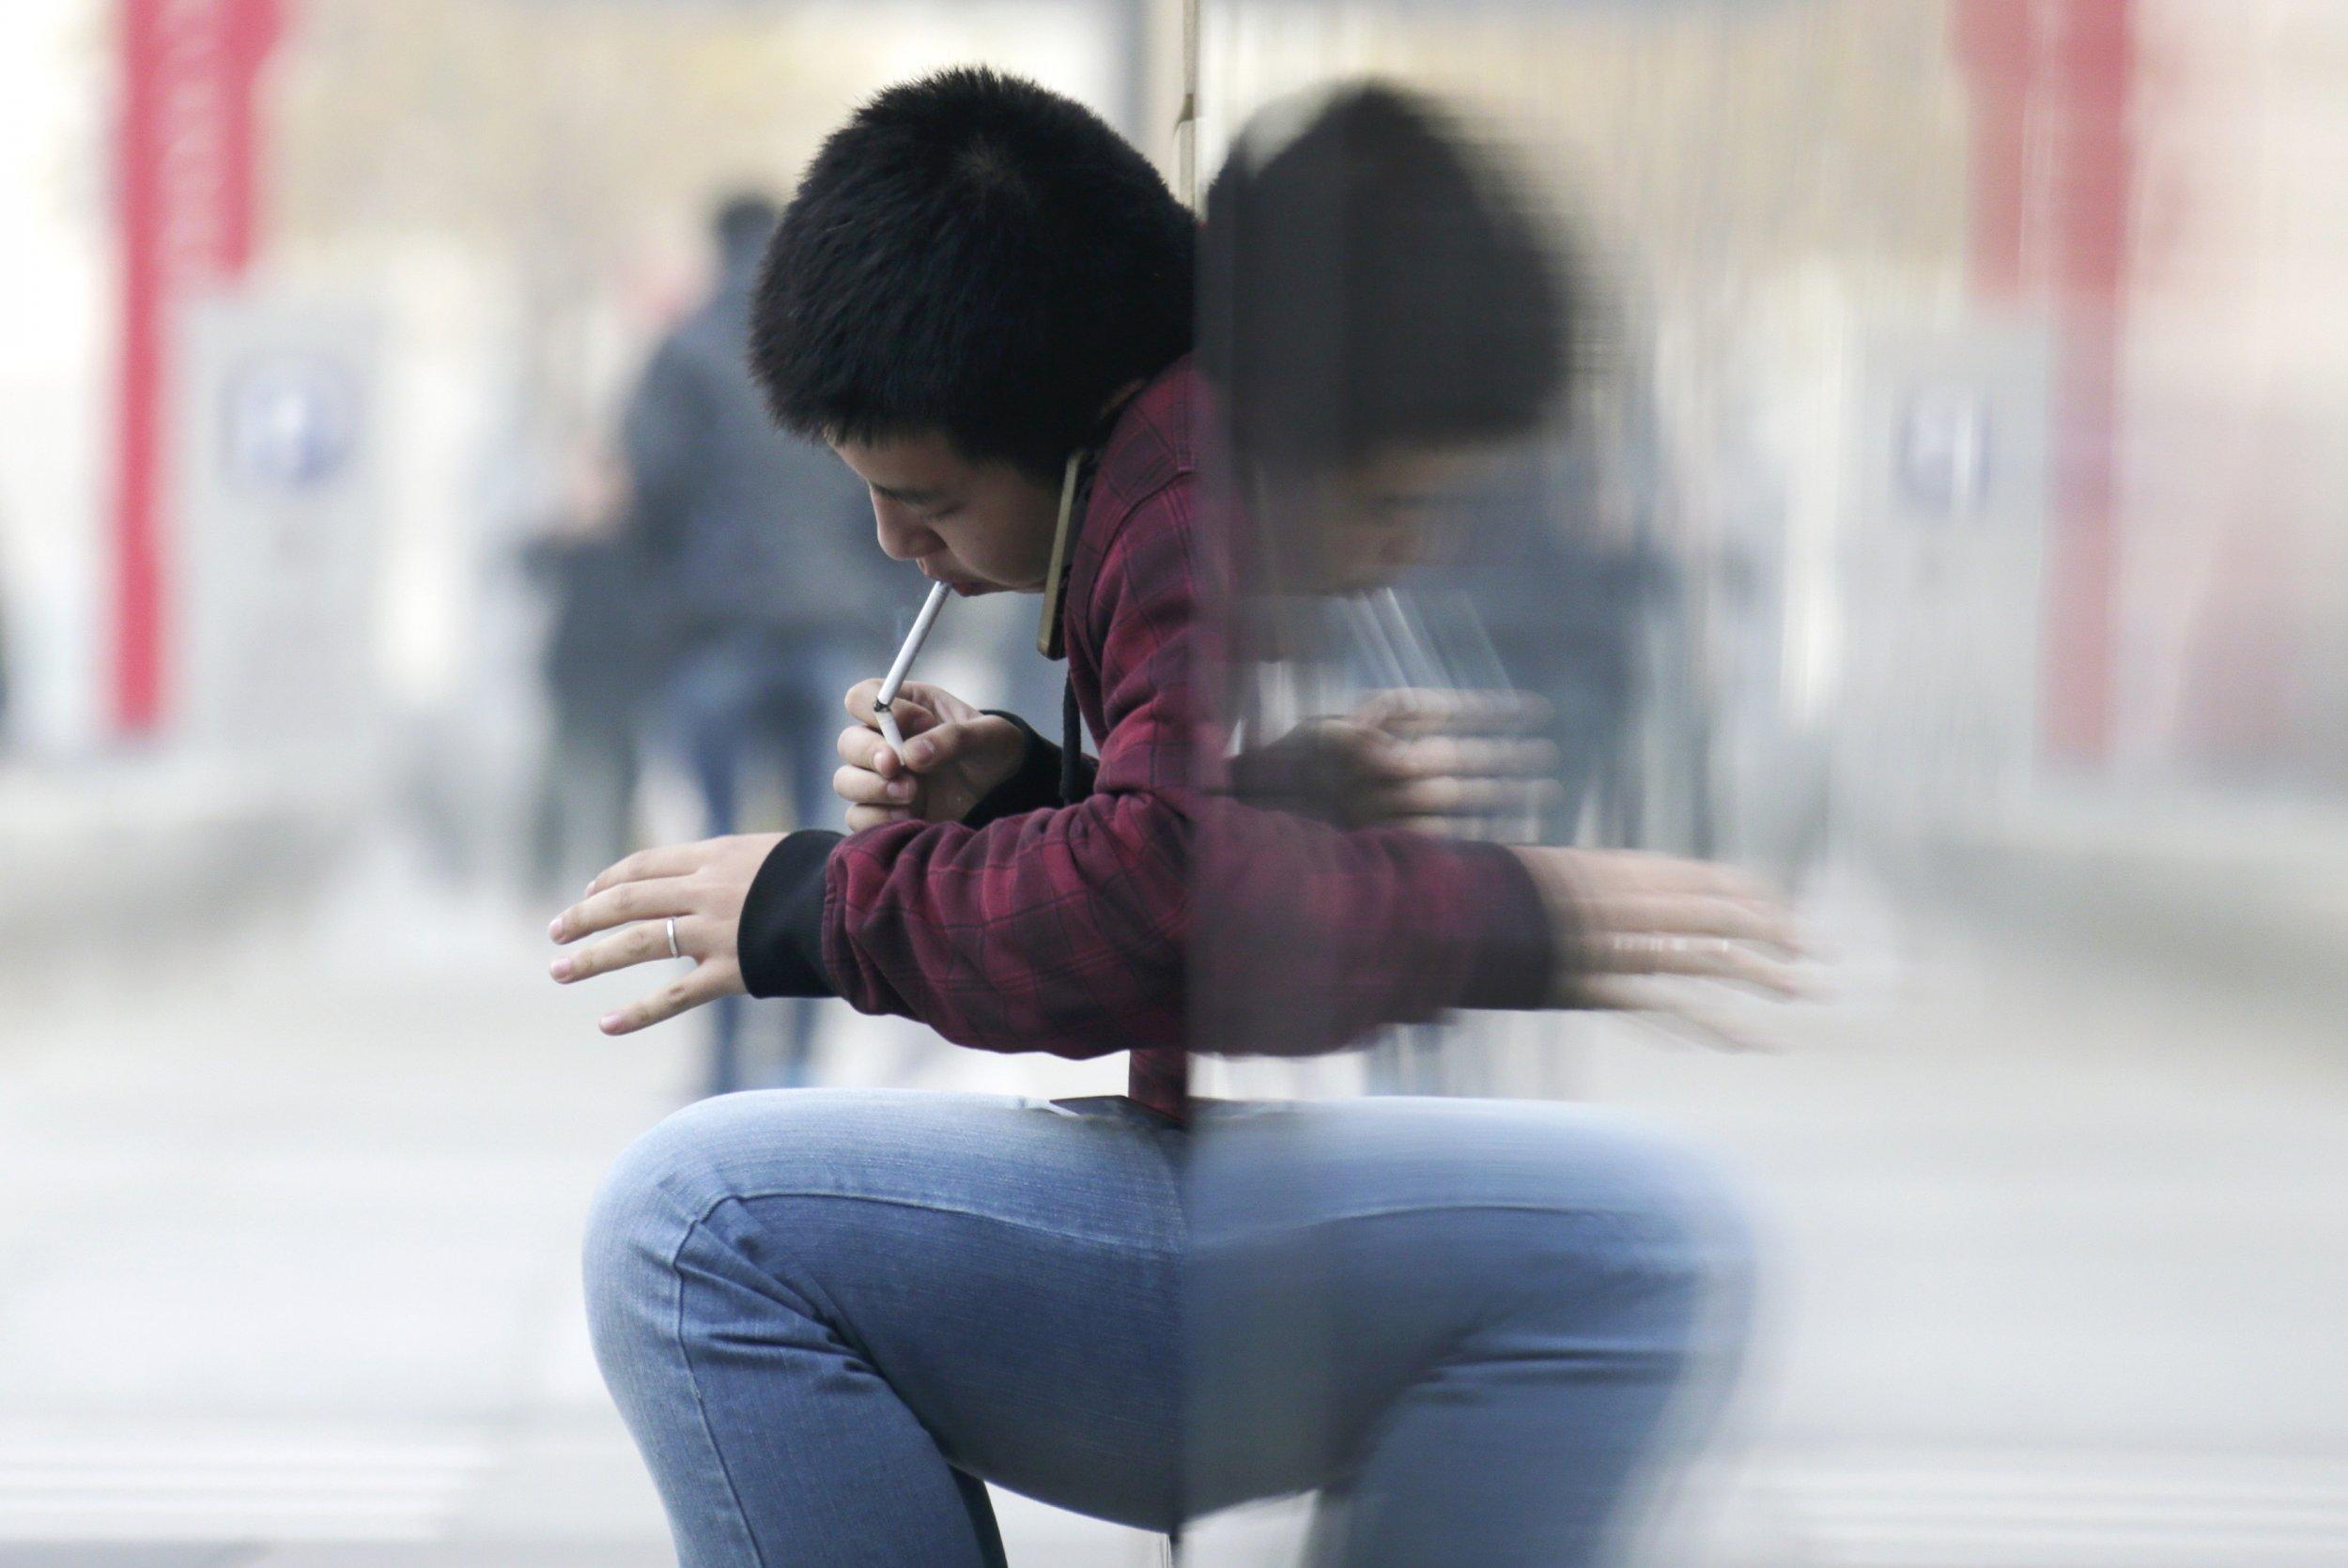 China's Smoking Problem: High Death Rates